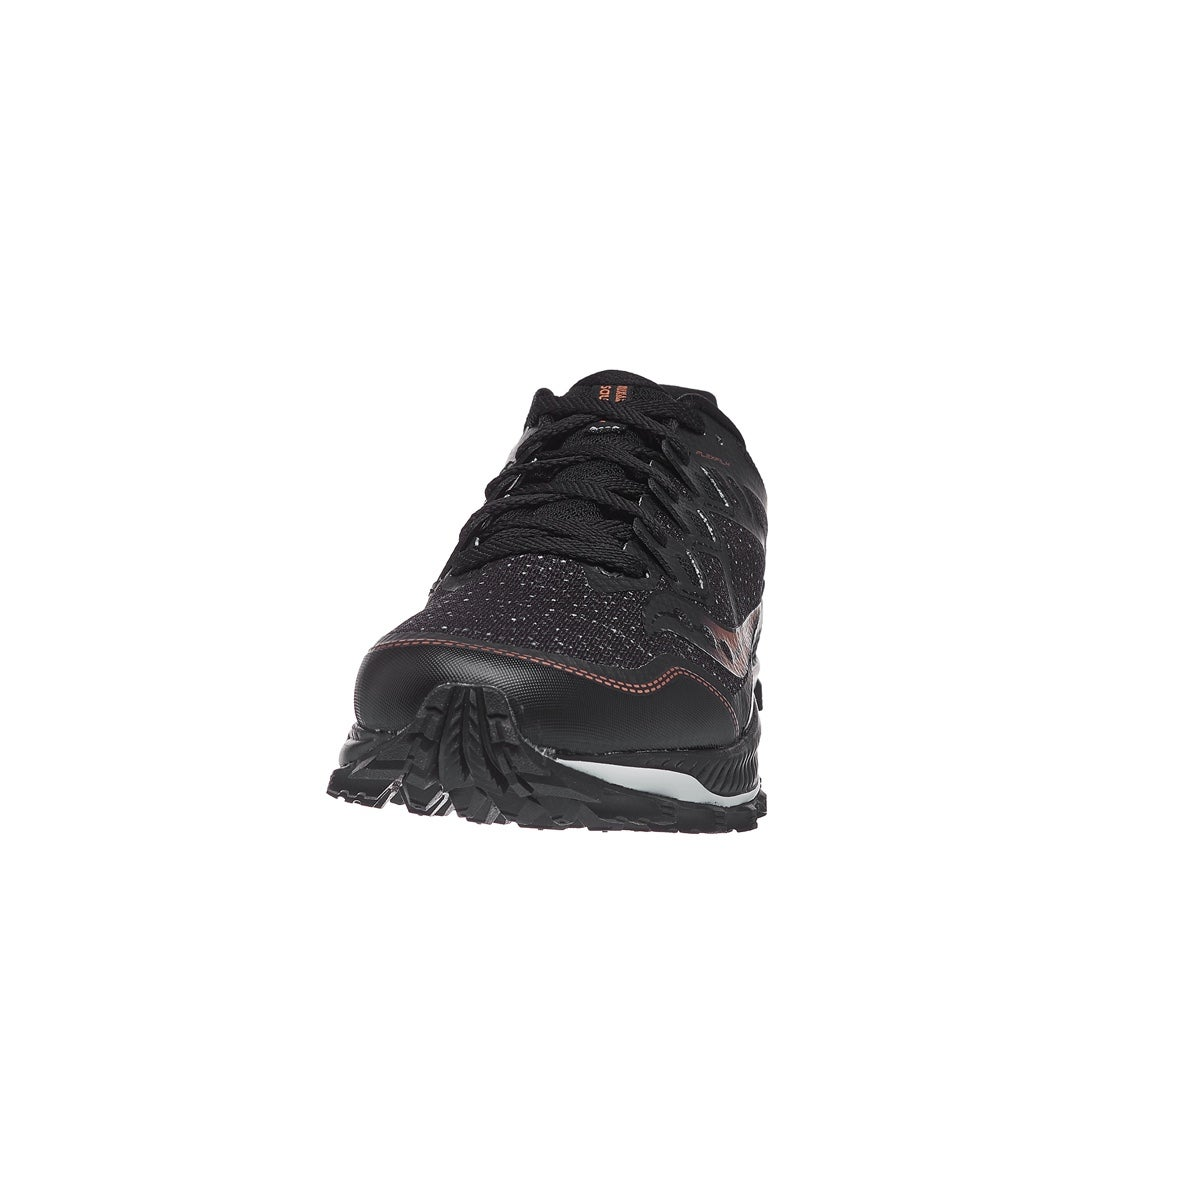 9ea7cc0e Saucony Peregrine 8 Men's Shoes Black/Denim/Copper 360° View ...